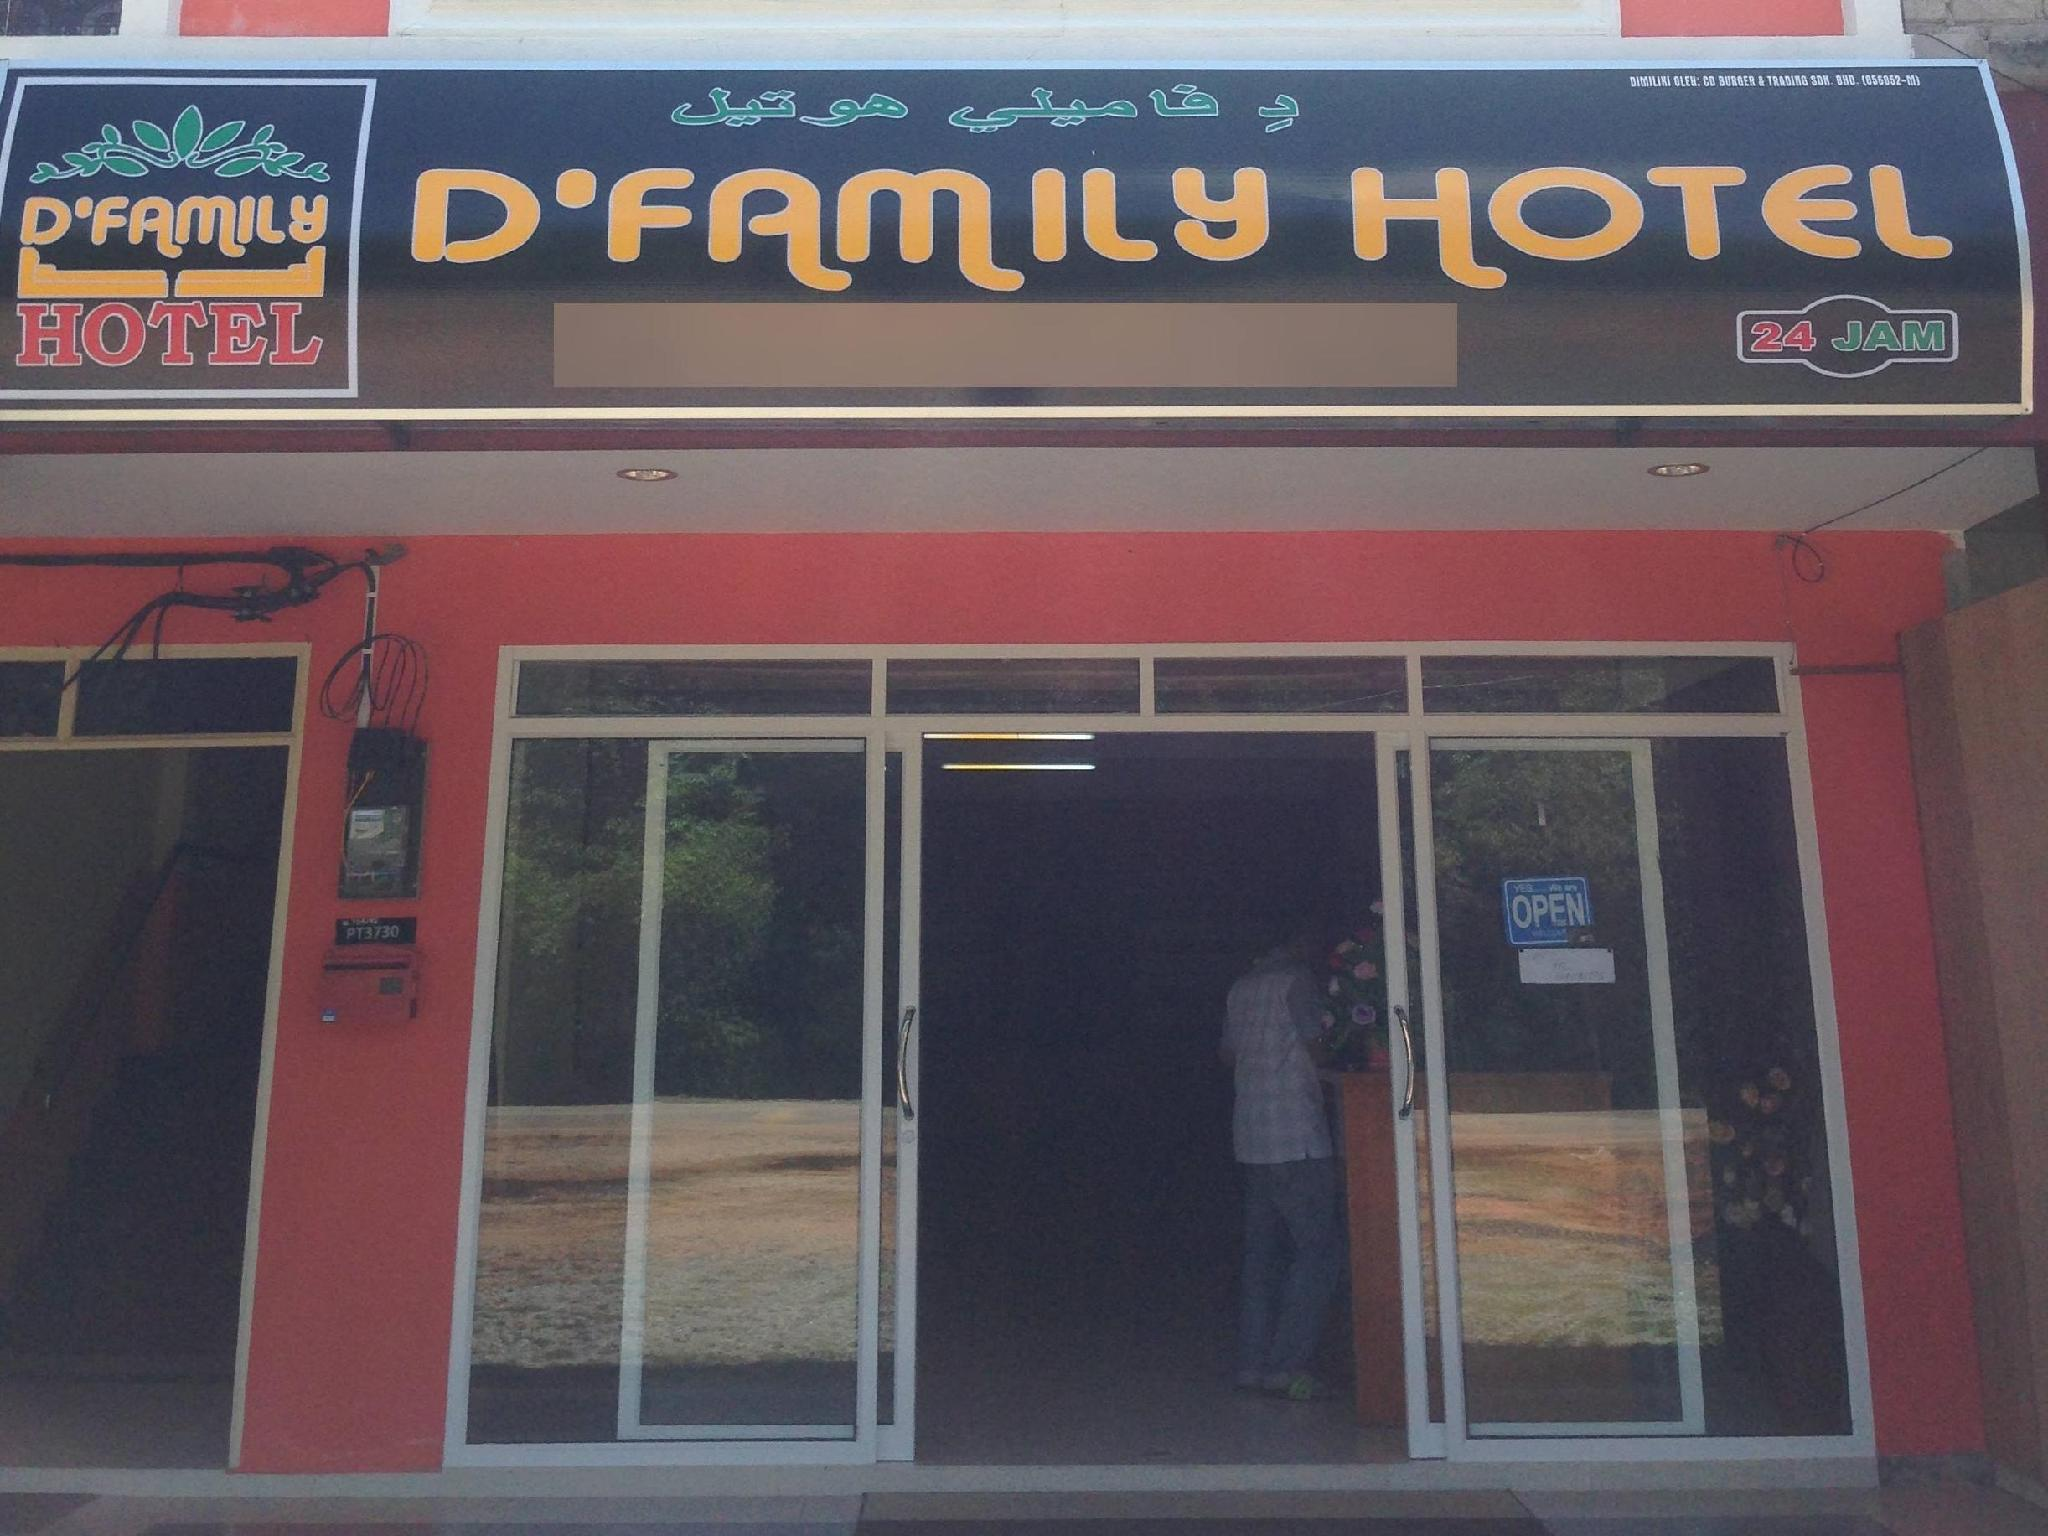 D Family Hotel Rantau Panjang